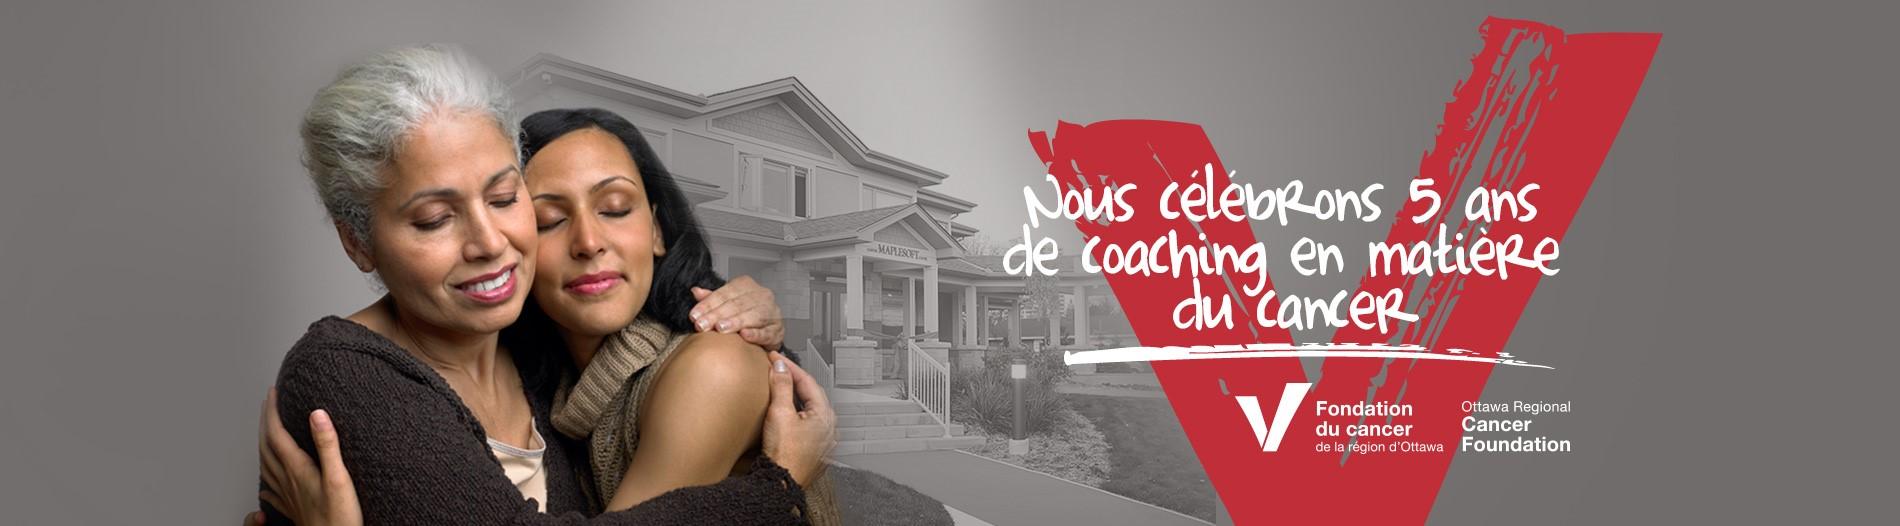 5-Year-Cancer-Coaching-Web-FR1